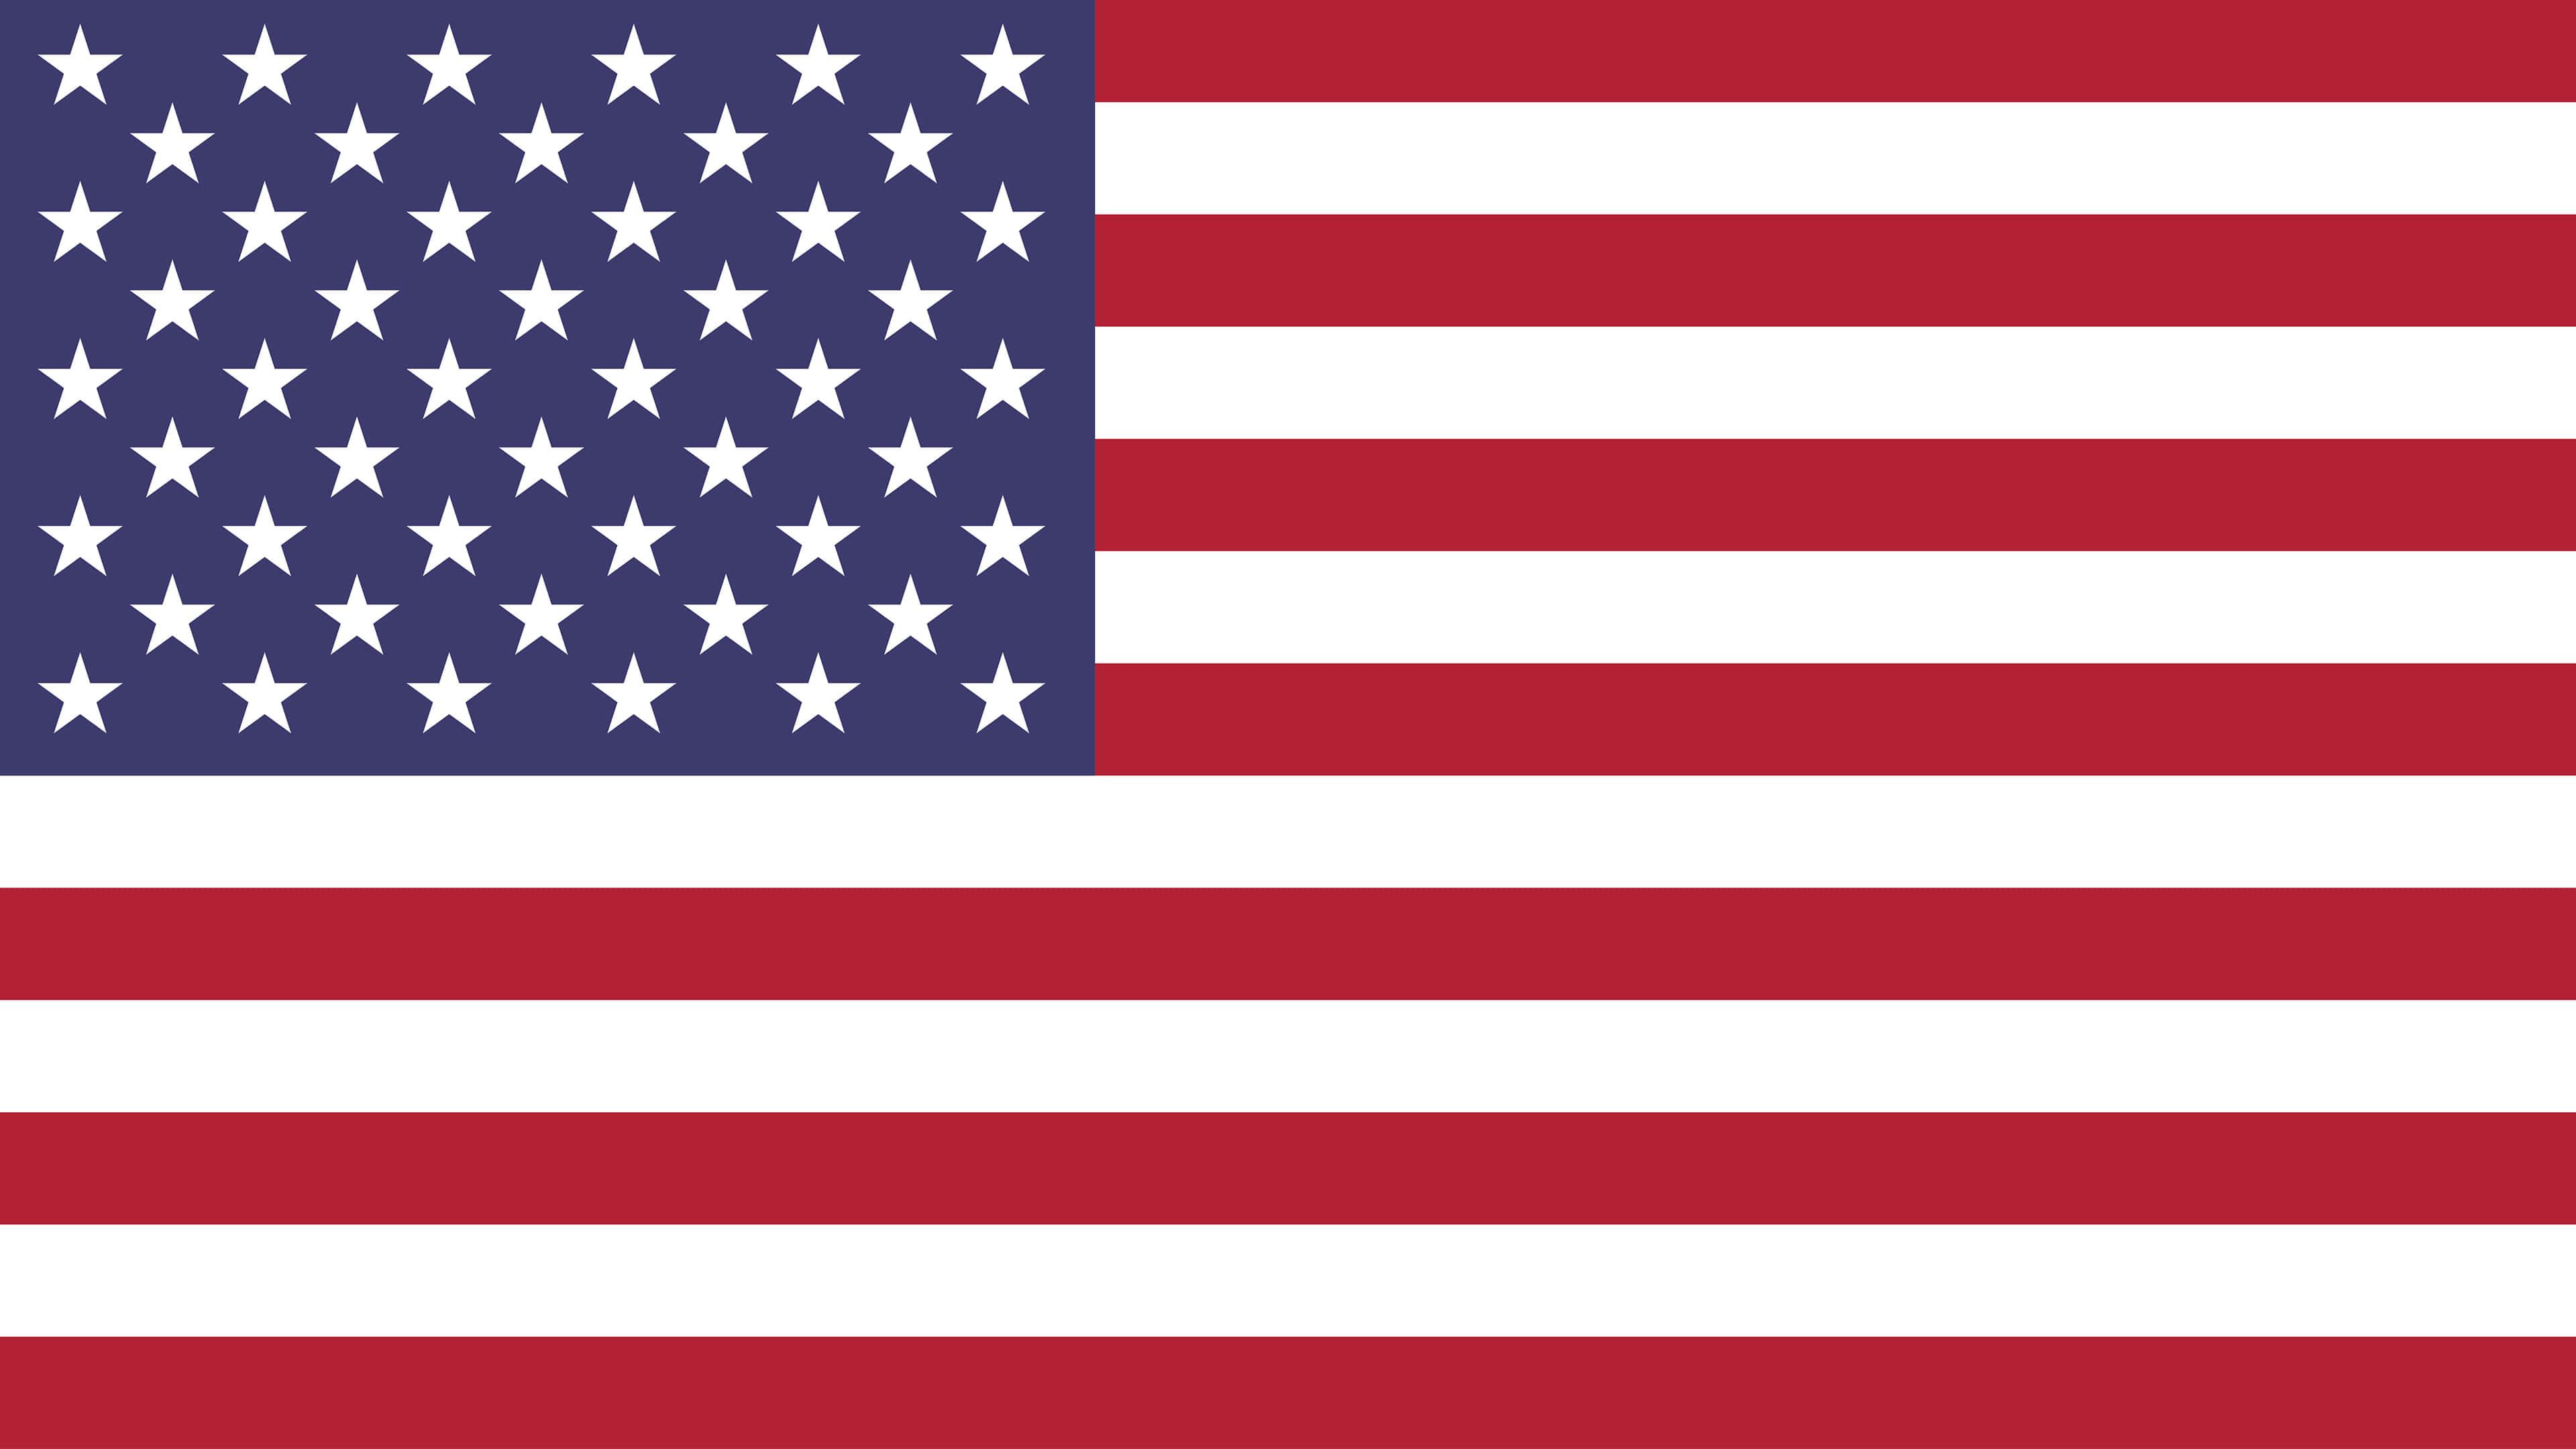 united states flag uhd 4k wallpaper